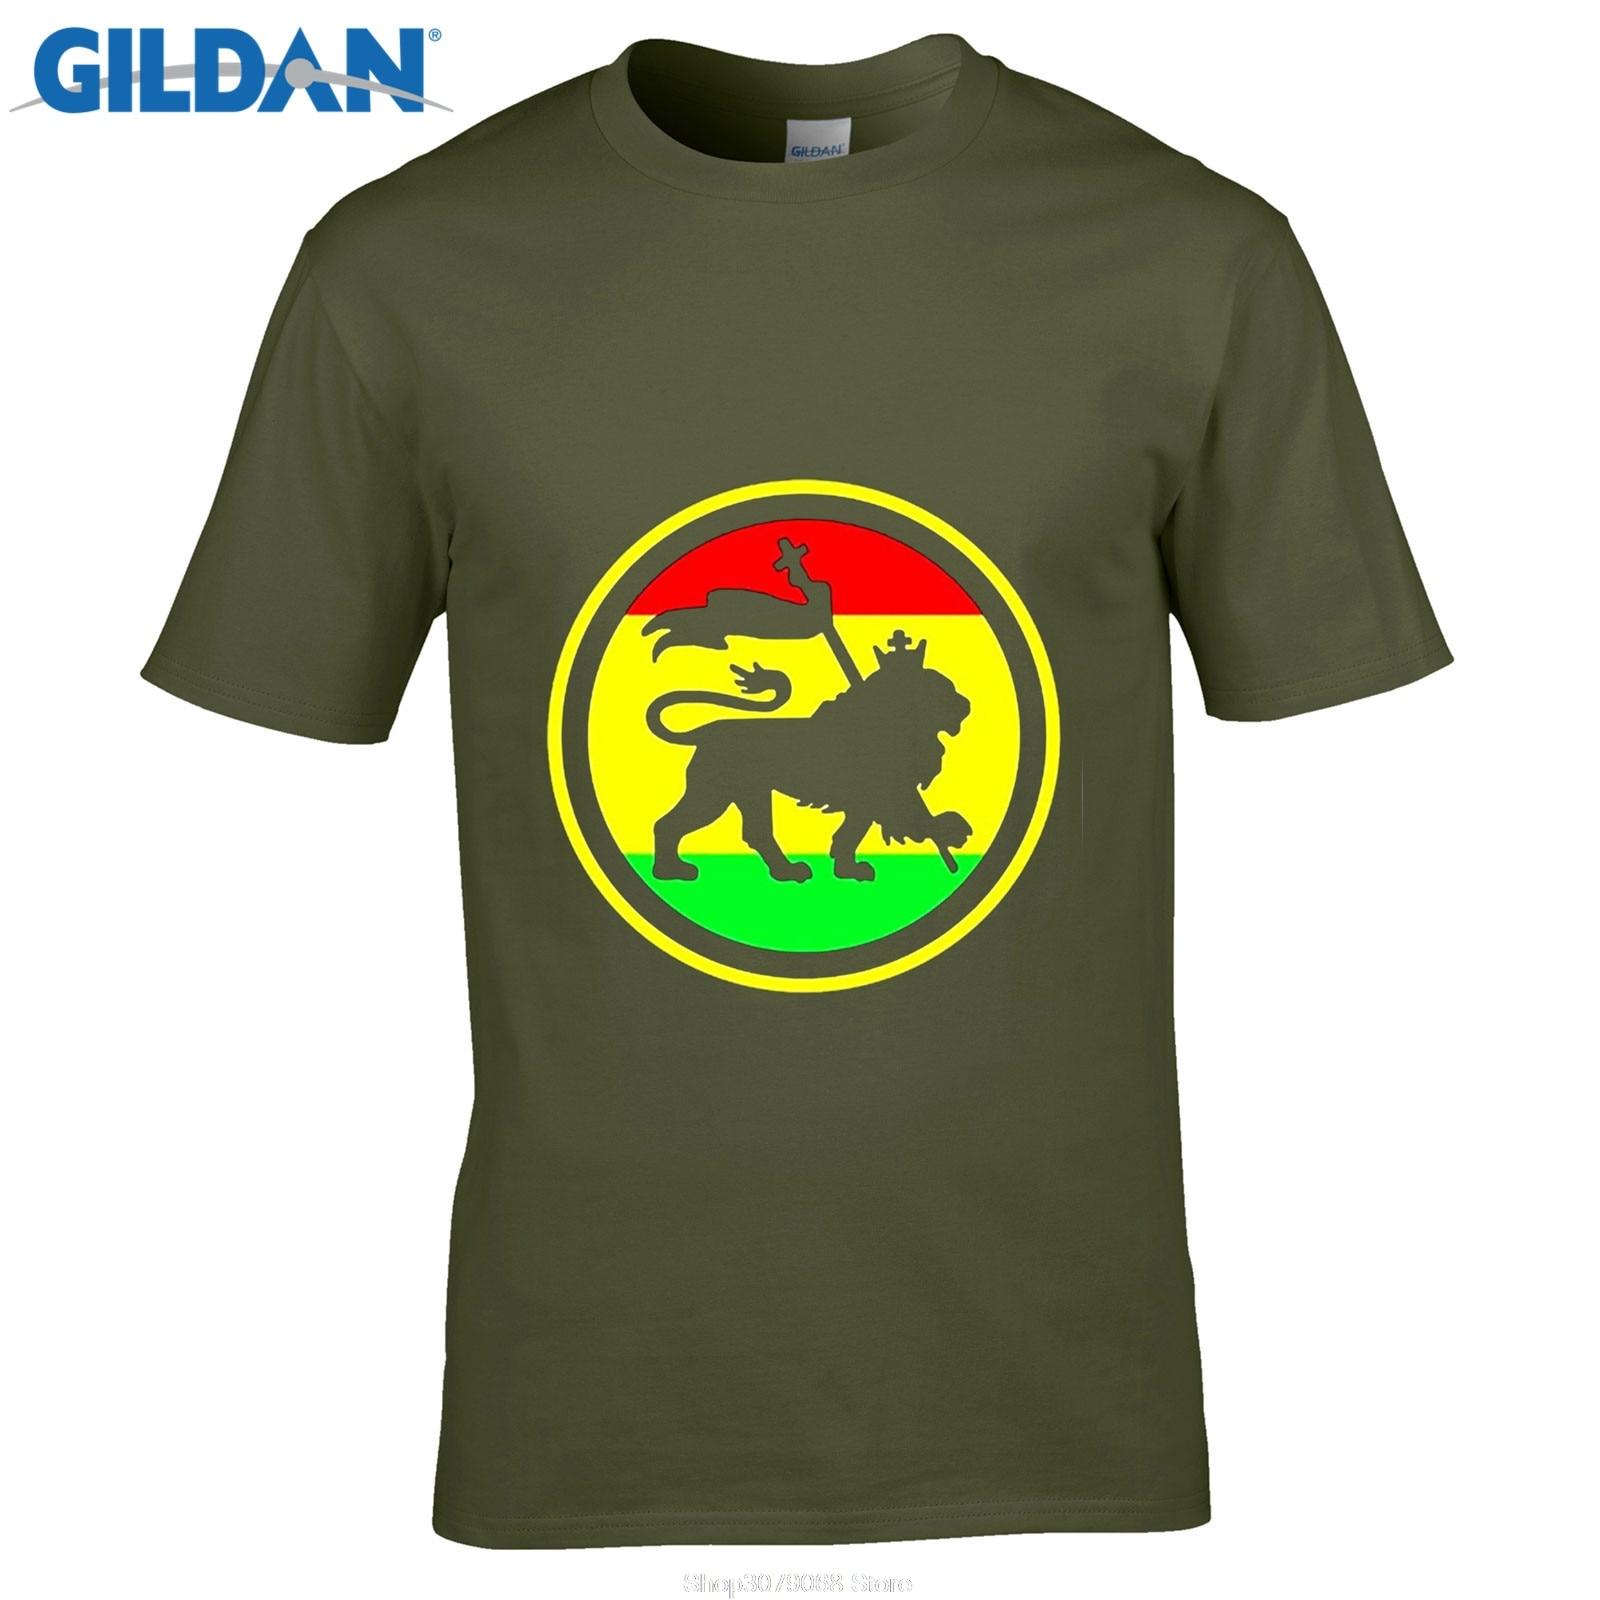 Design t shirt price - Gildan Designer T Shirtlowest Price Printe Design Graphic T Shirts Rasta Lion Judah Crew Neck Men